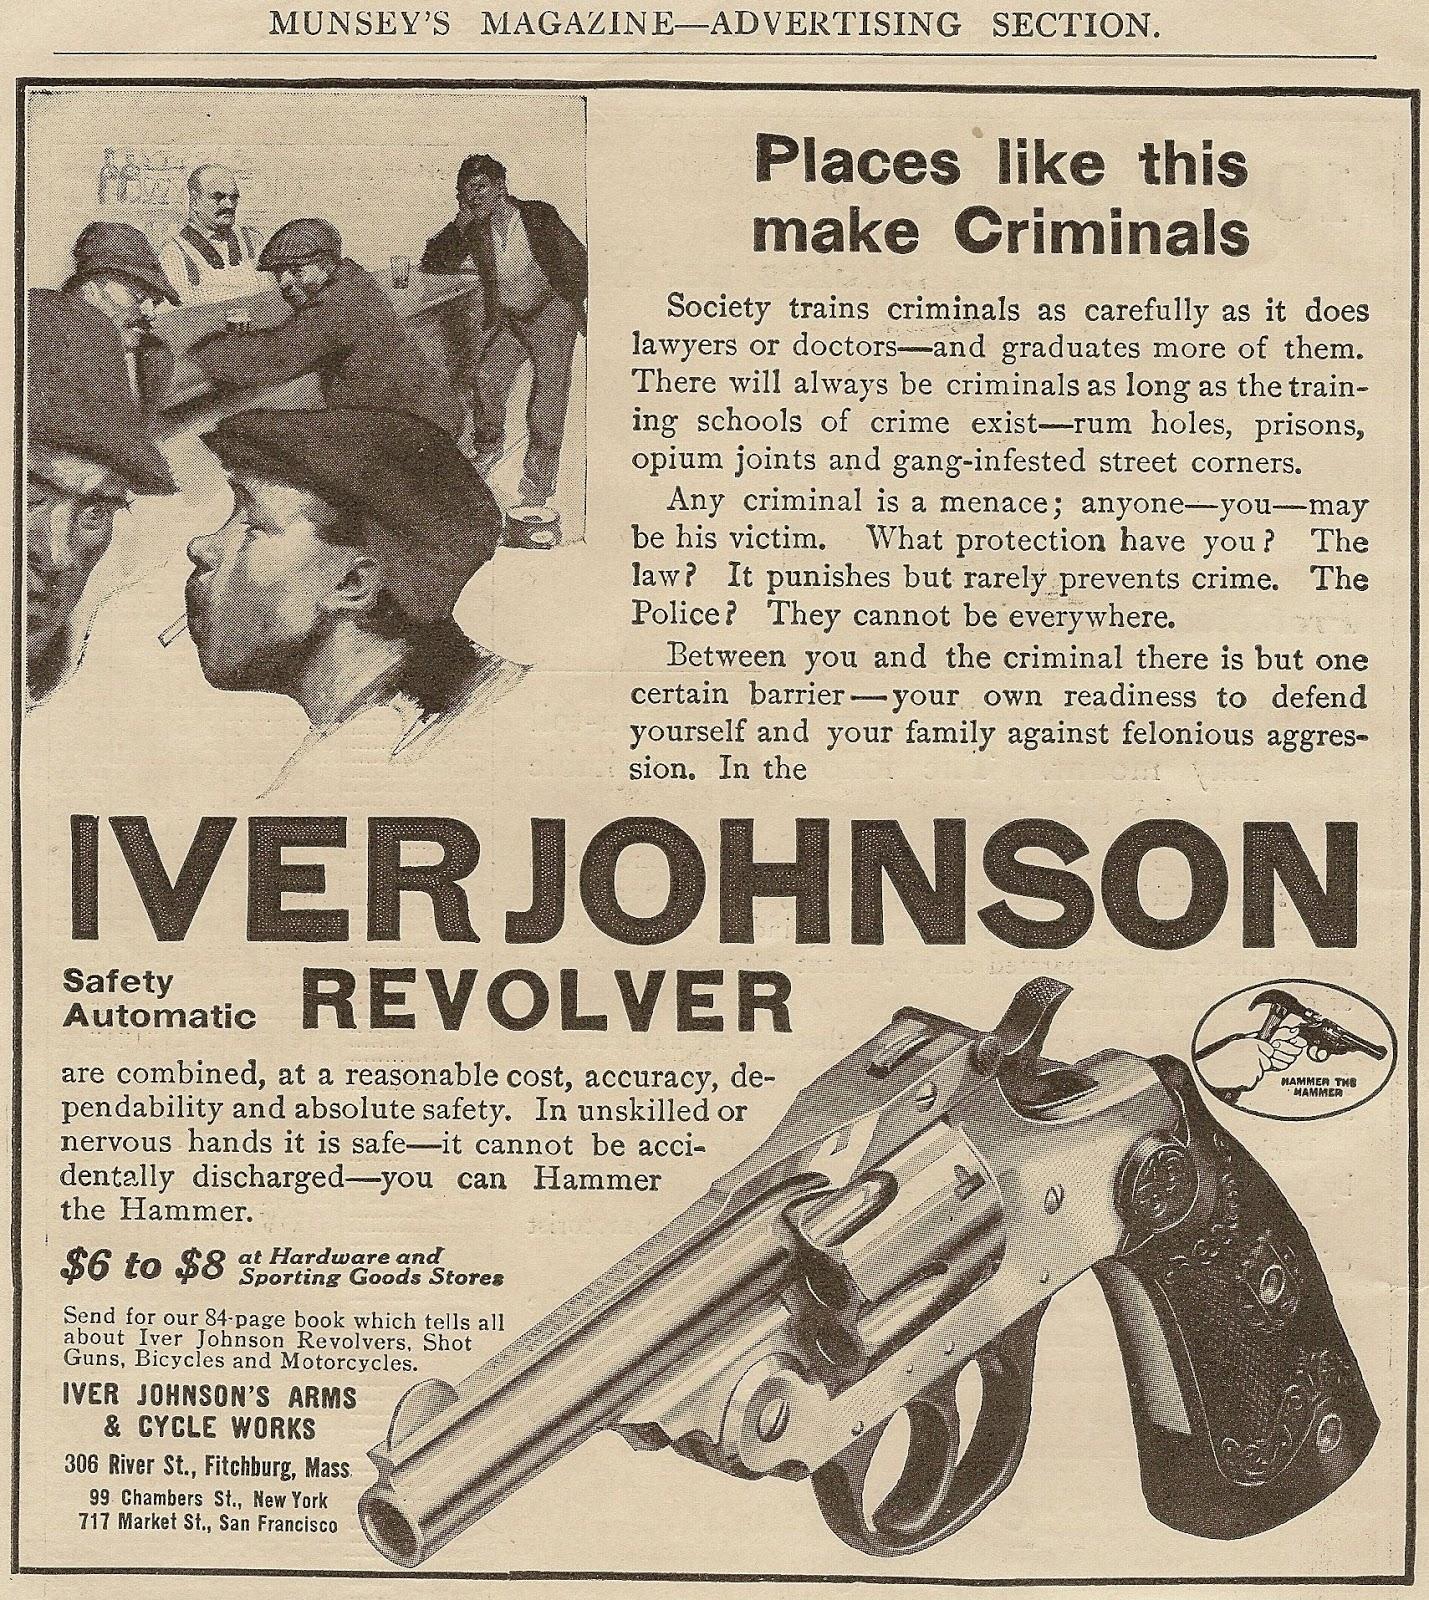 Vintage Iver Johnson Ad From MUNSEY 'S MAGAZINE